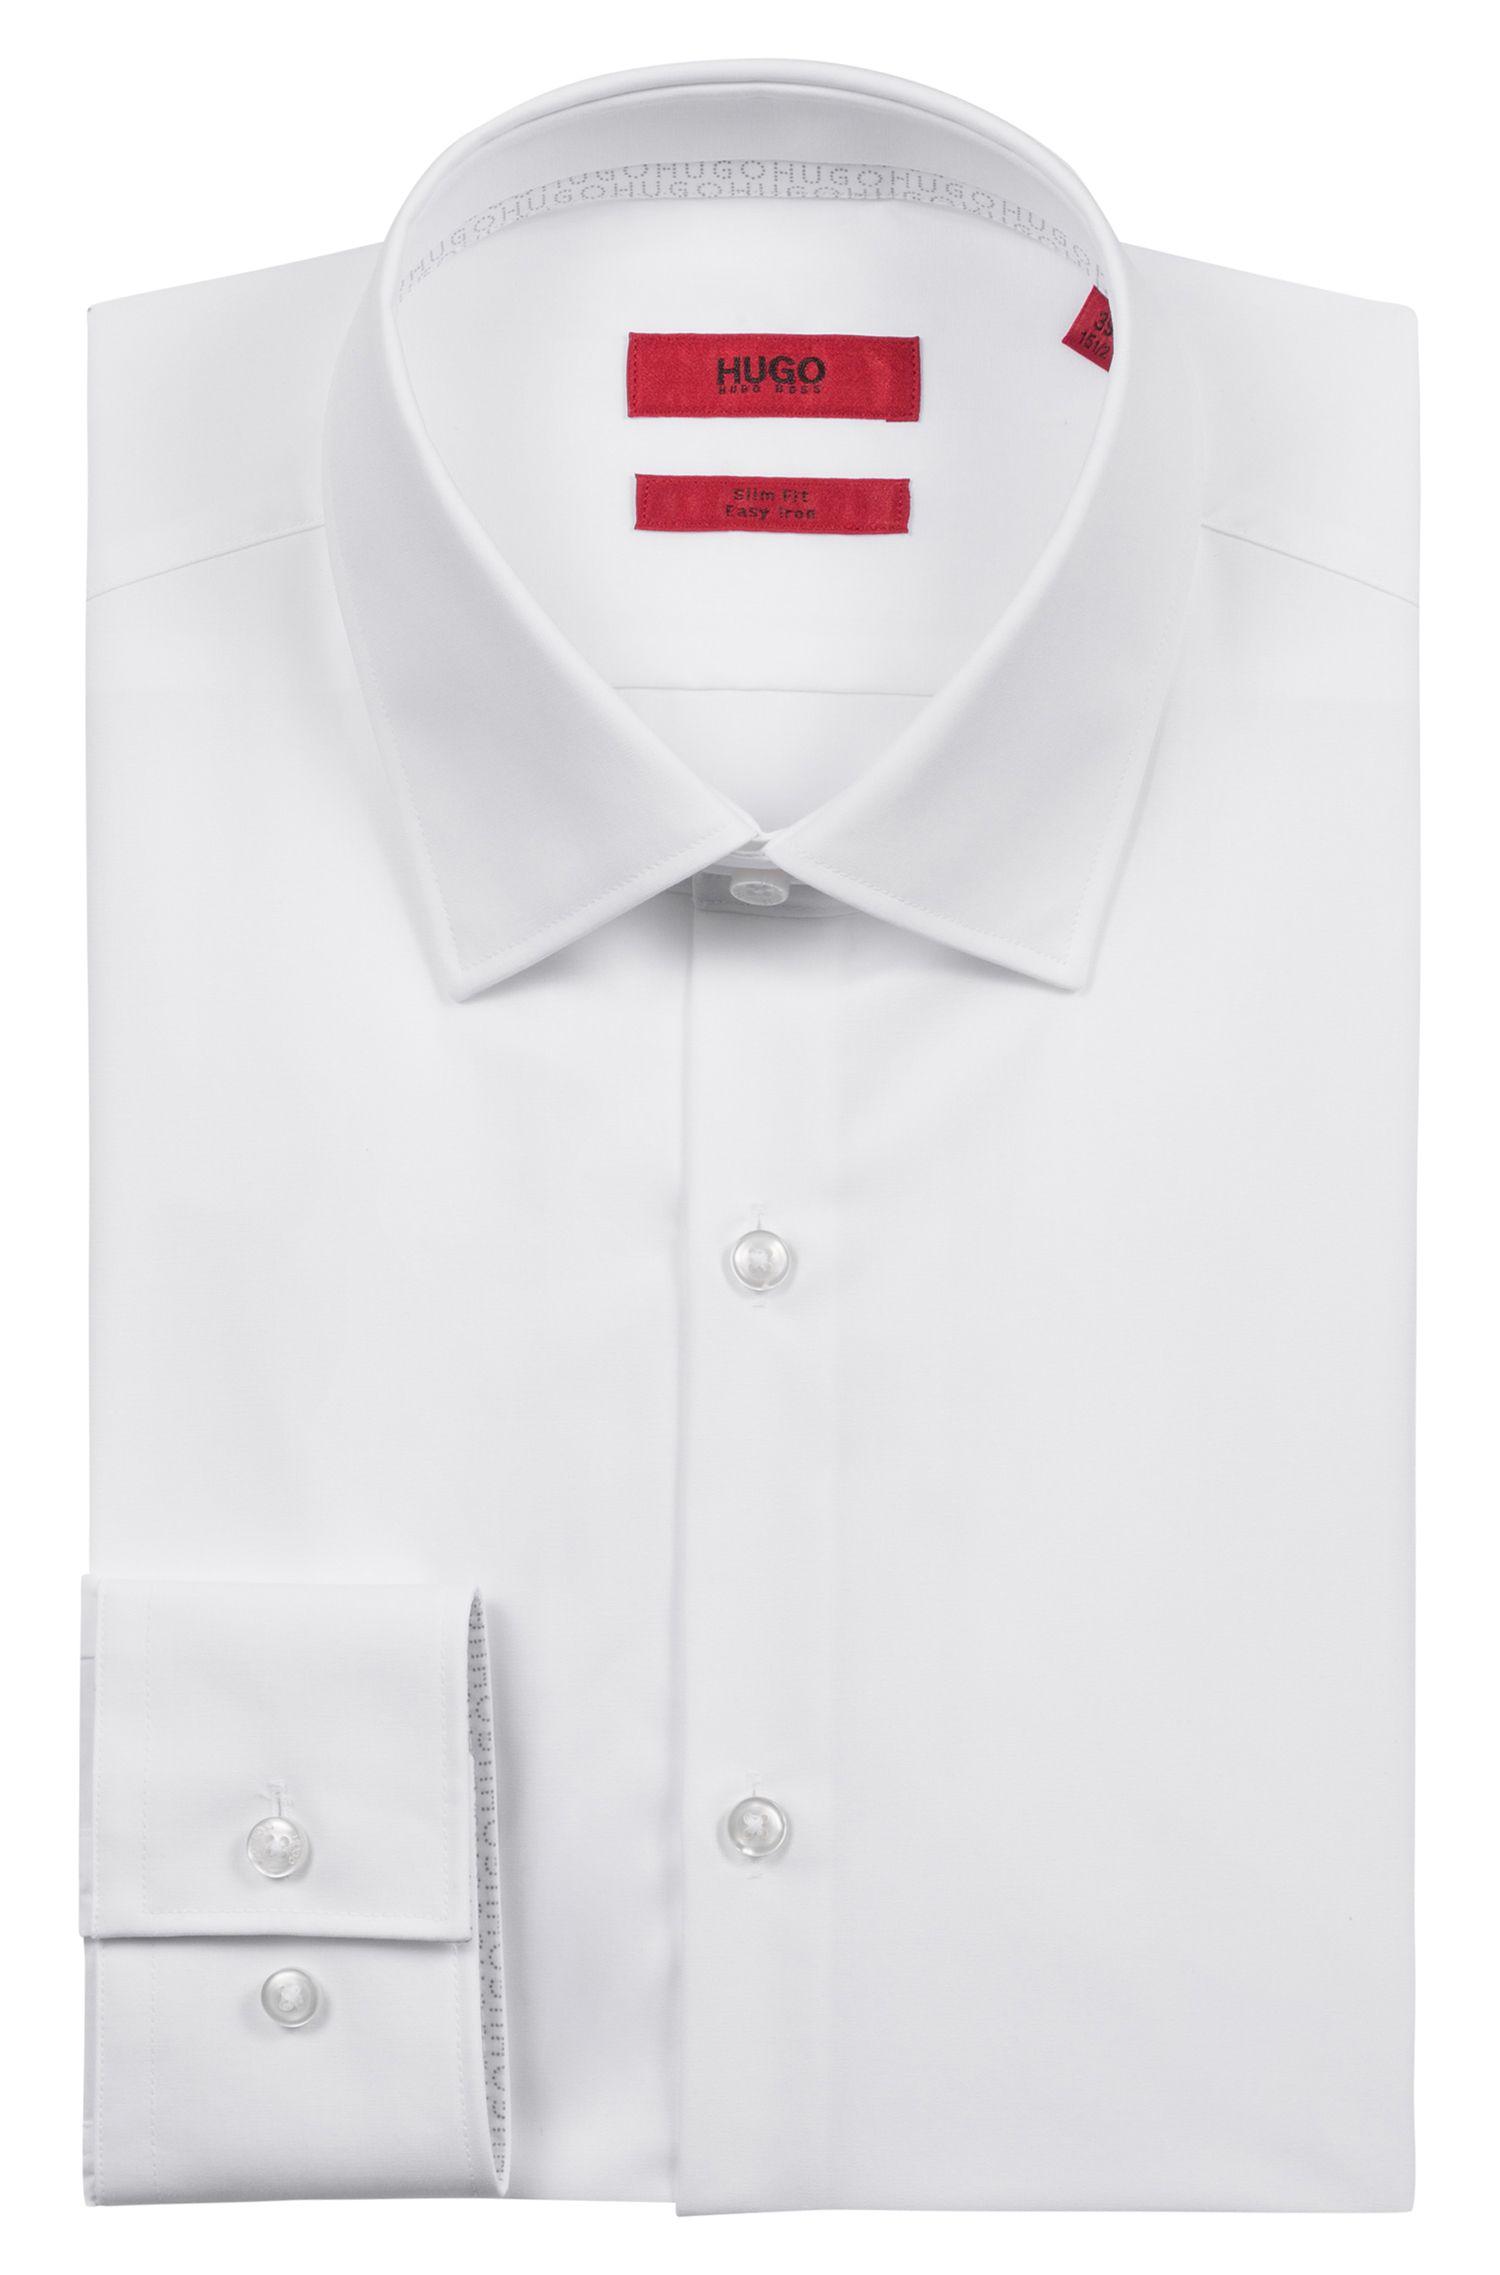 Slim-fit shirt in easy-iron cotton with internal logo trim HUGO BOSS